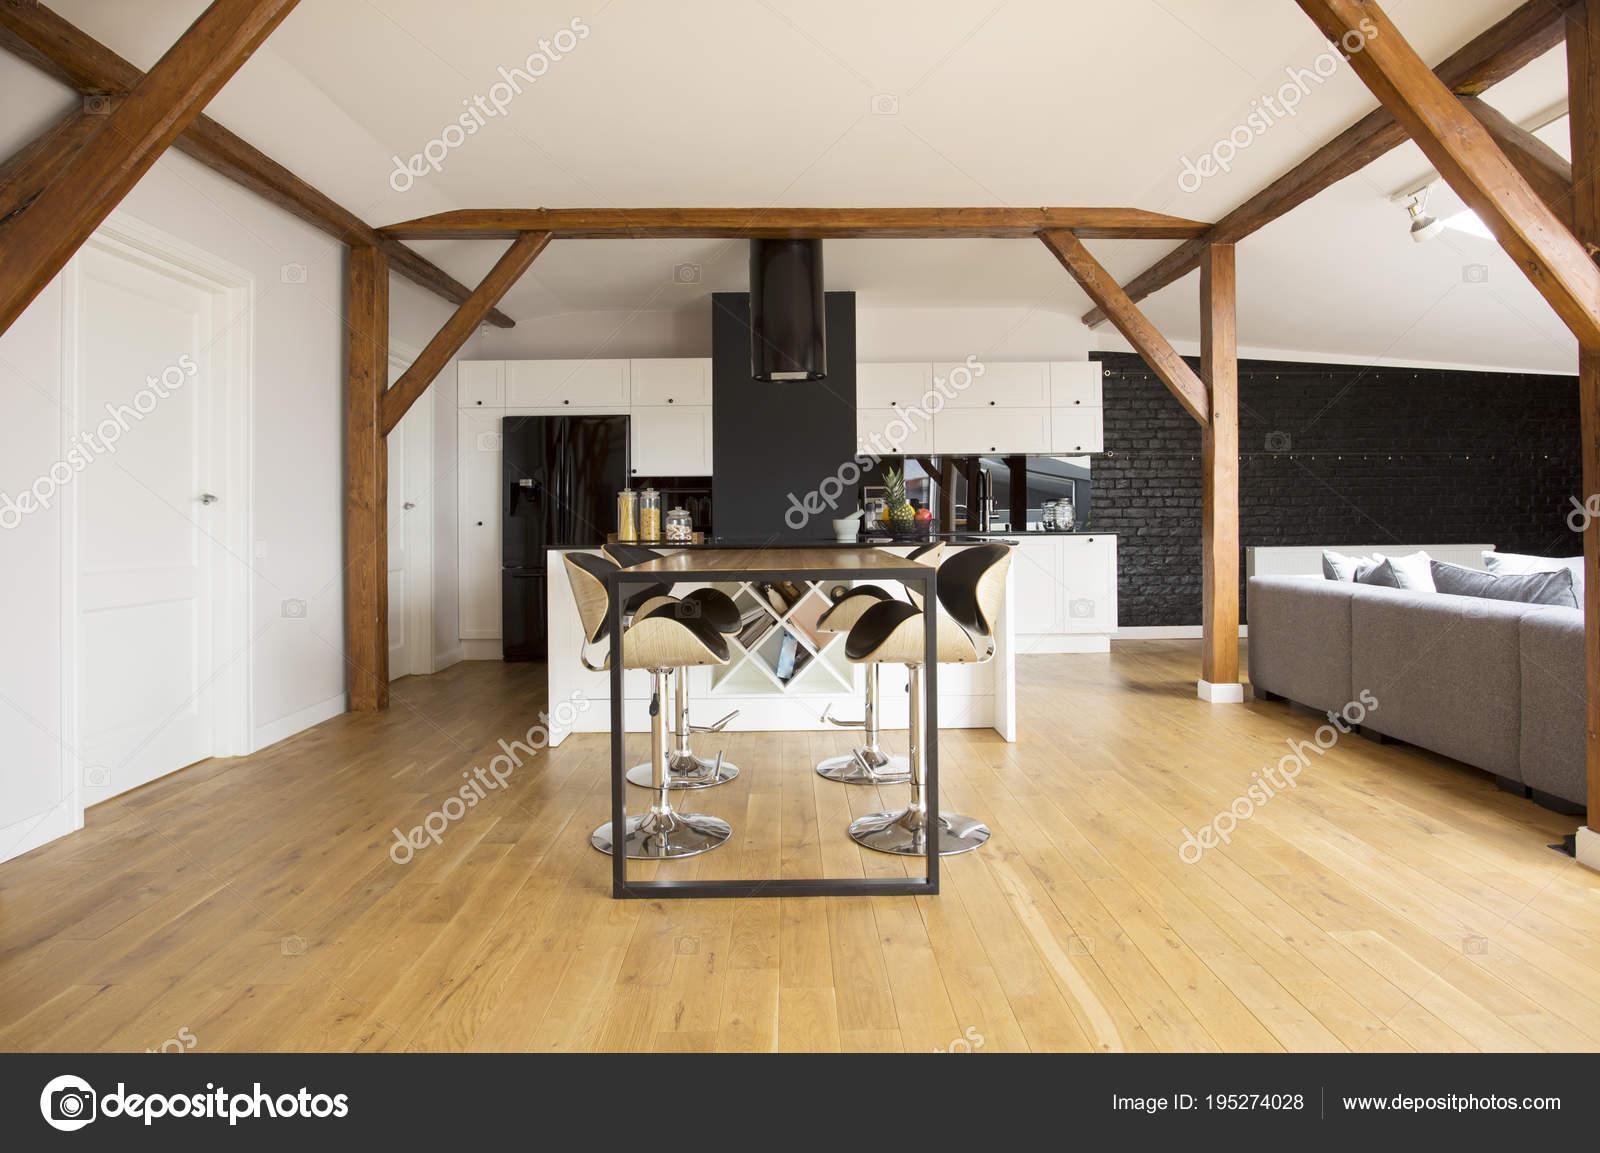 Bar sgabelli e tavolo u foto stock photographee eu